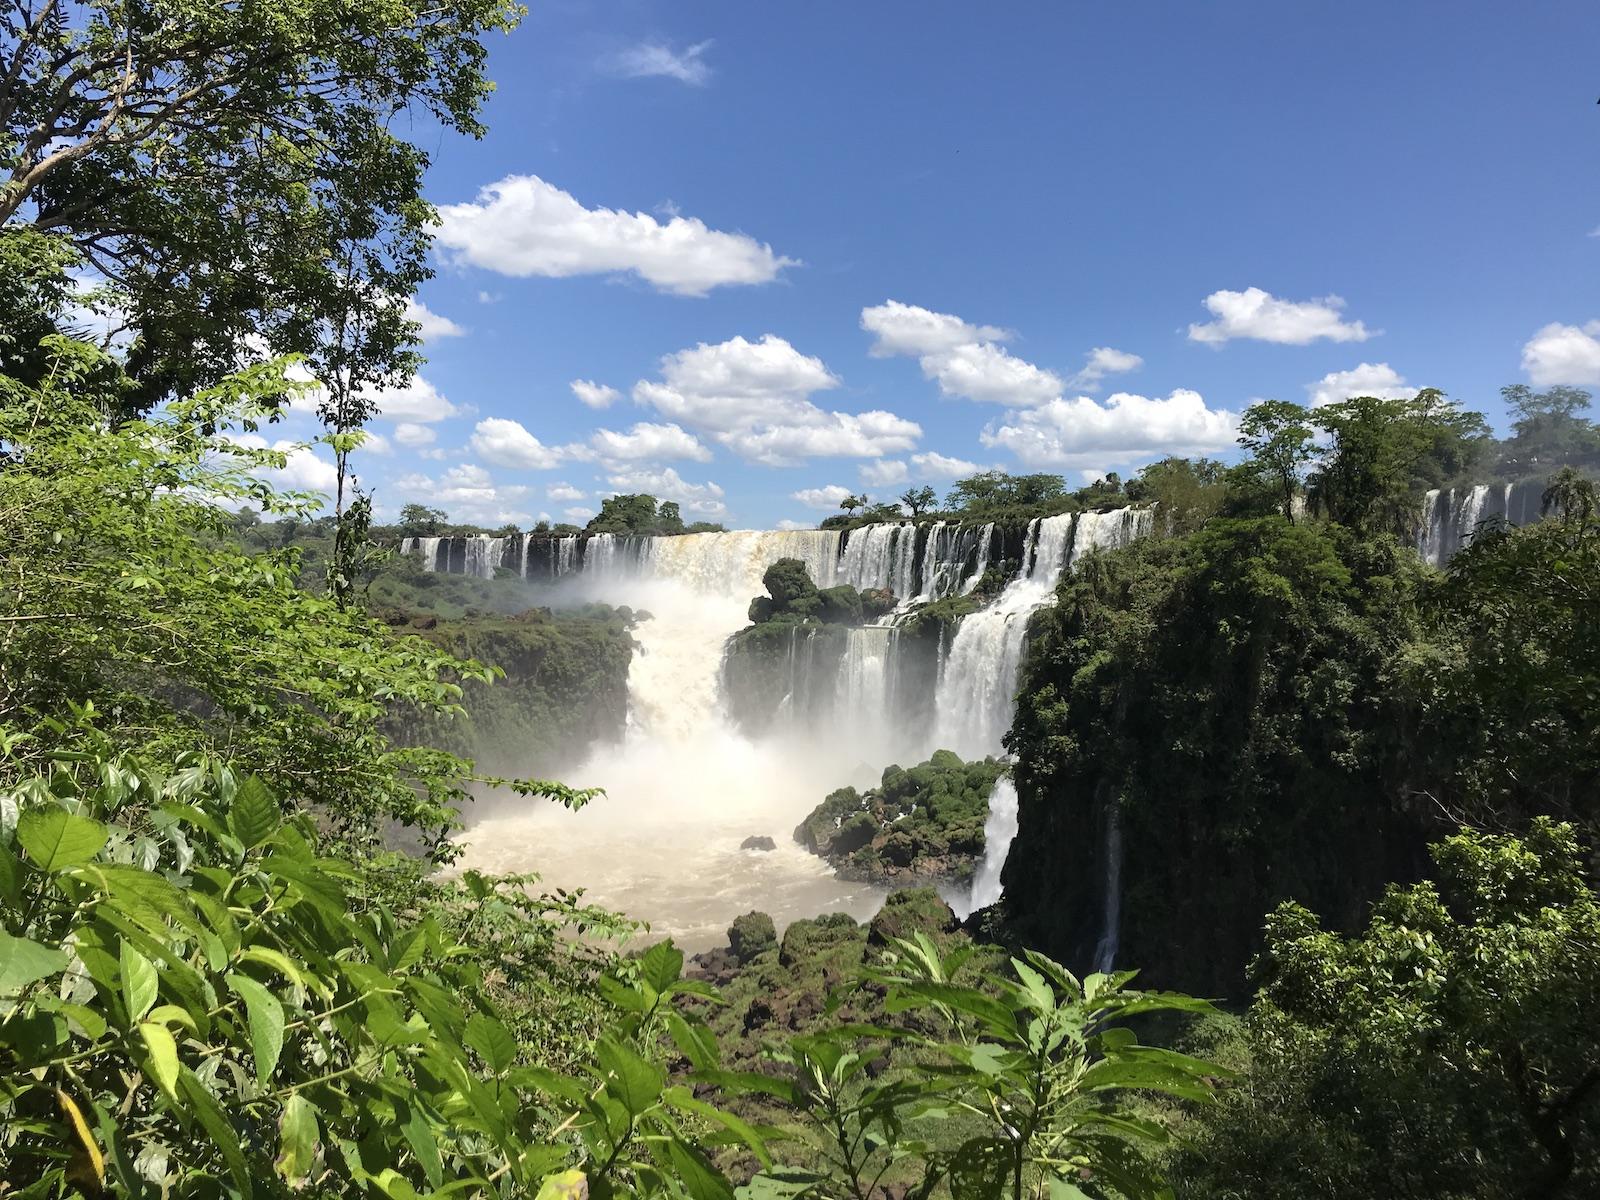 tourameo-reiseplanung-individualreise-brasilien-reise-iguacu-wasserfaelle